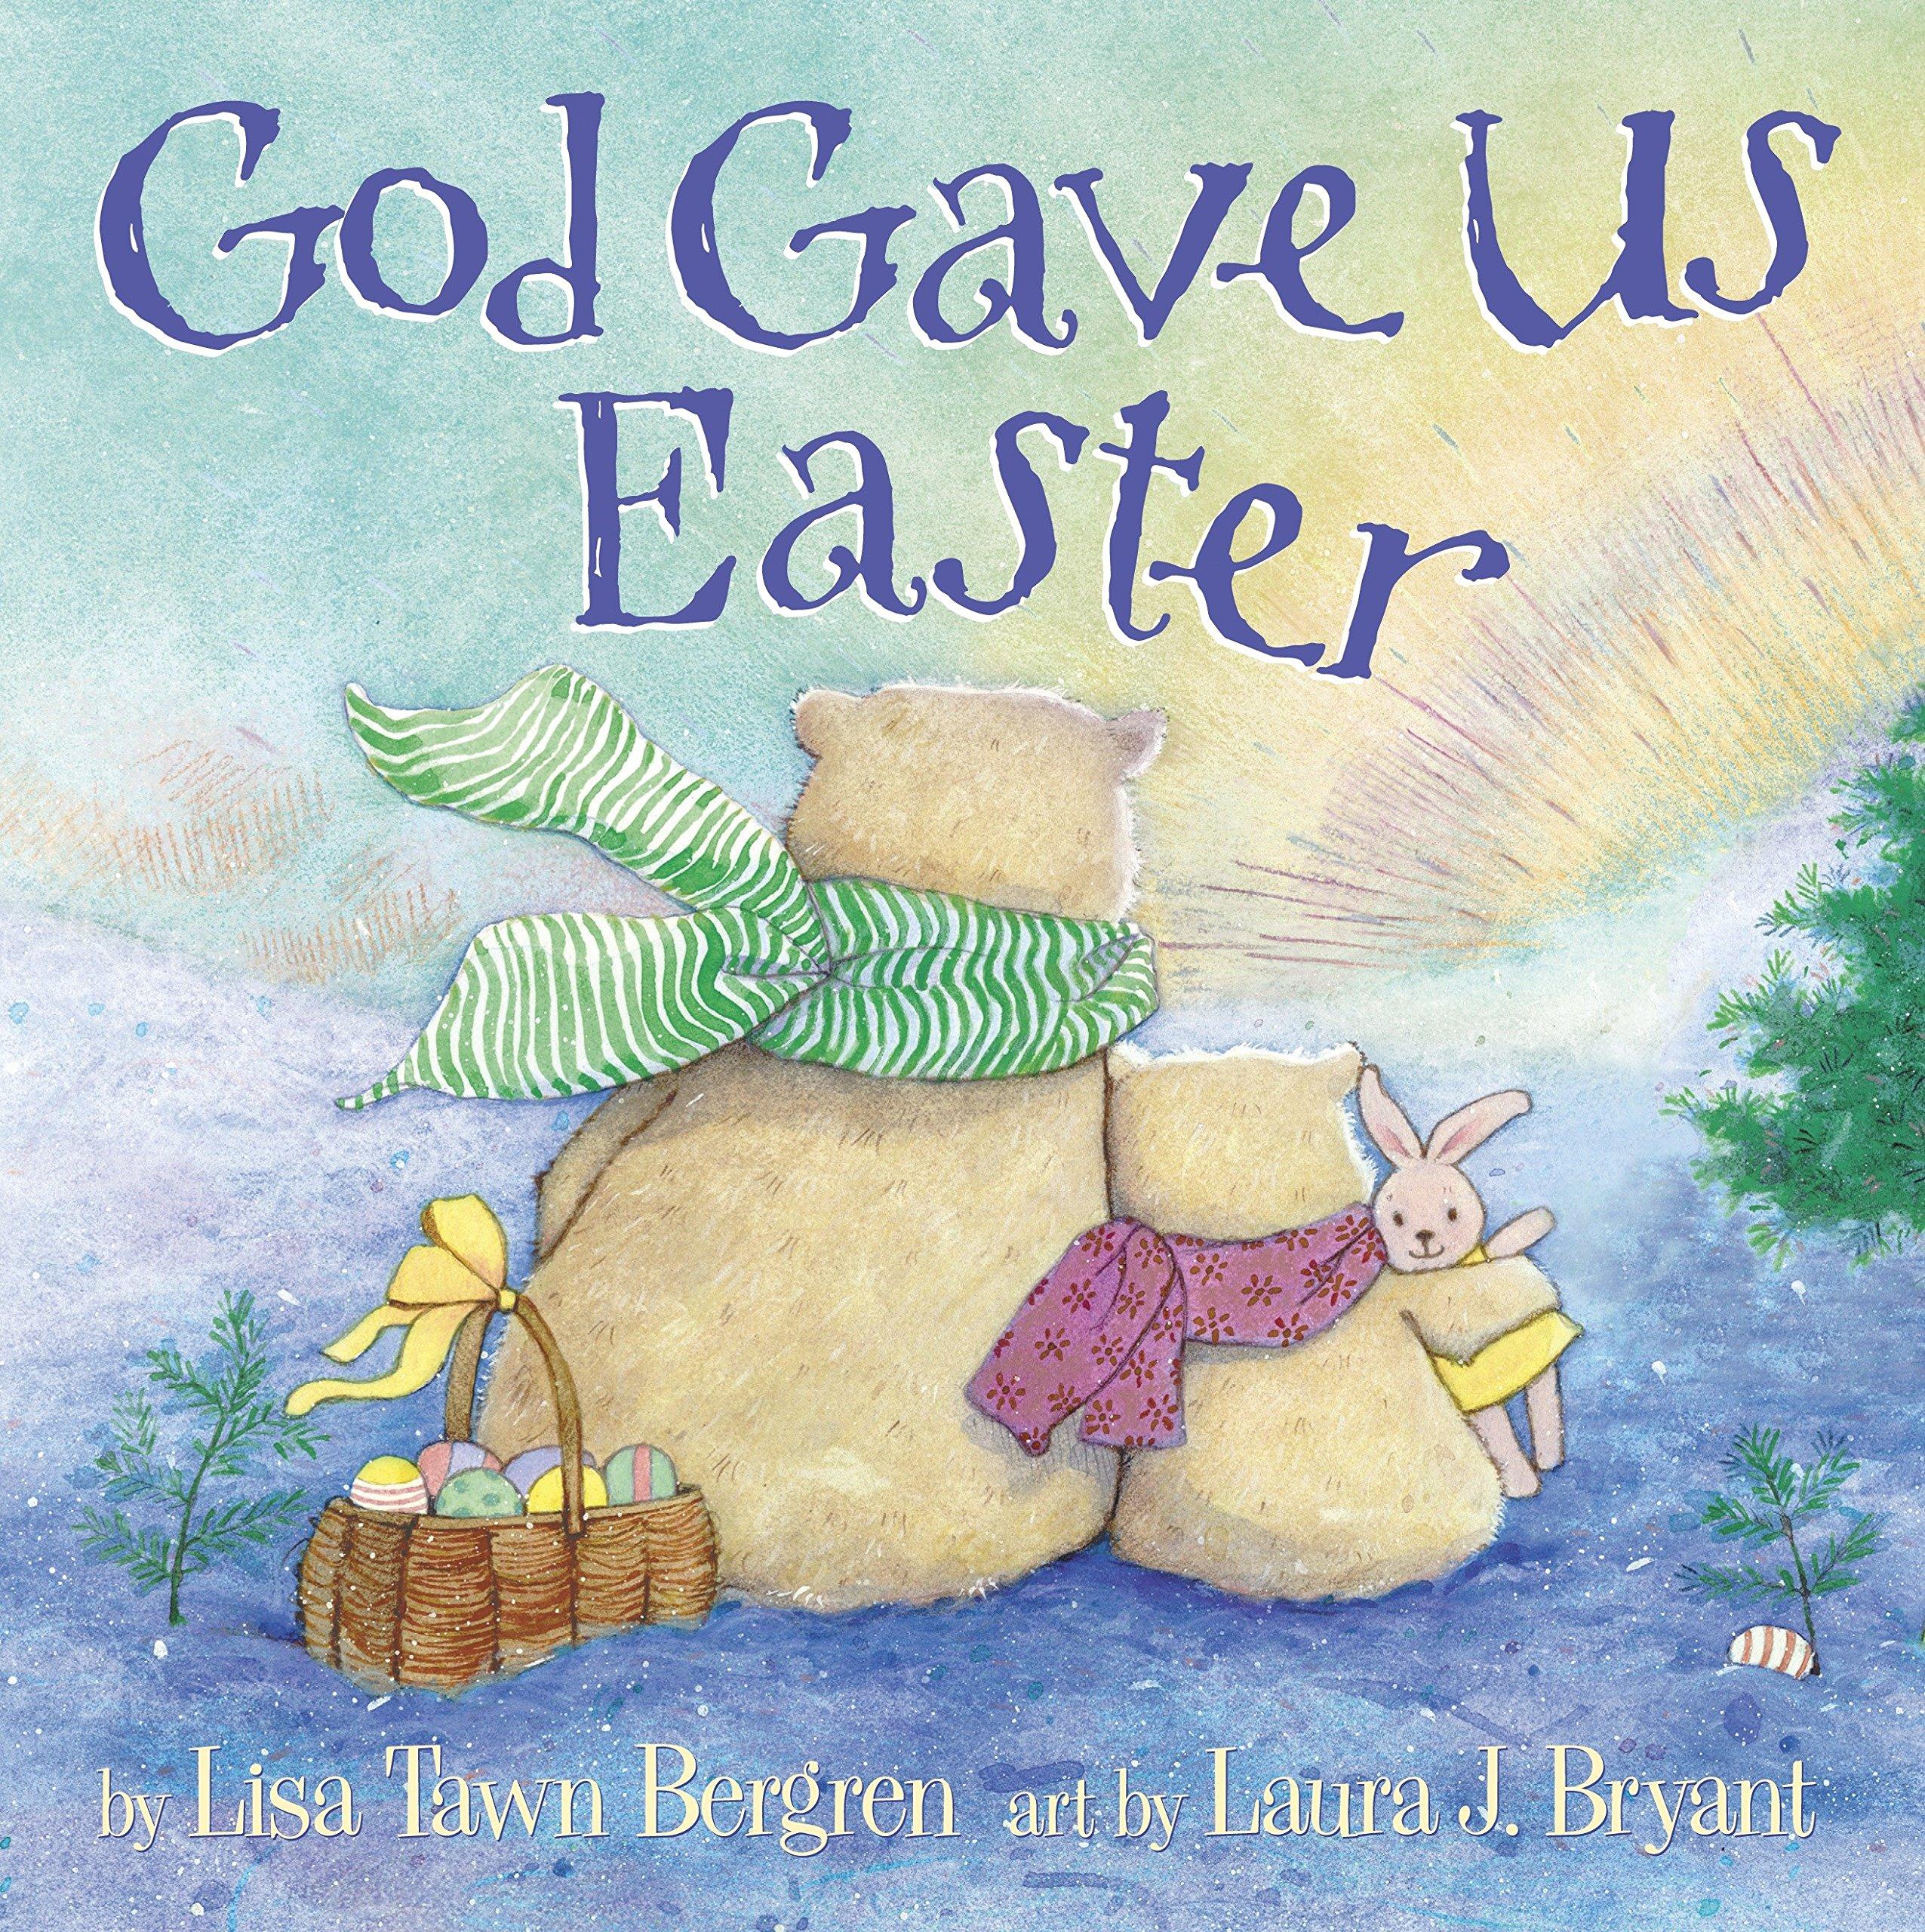 1f1206d3 Amazon.com: God Gave Us Easter (God Gave Us Series) (9780307730725): Lisa  Tawn Bergren, Laura J. Bryant: Books